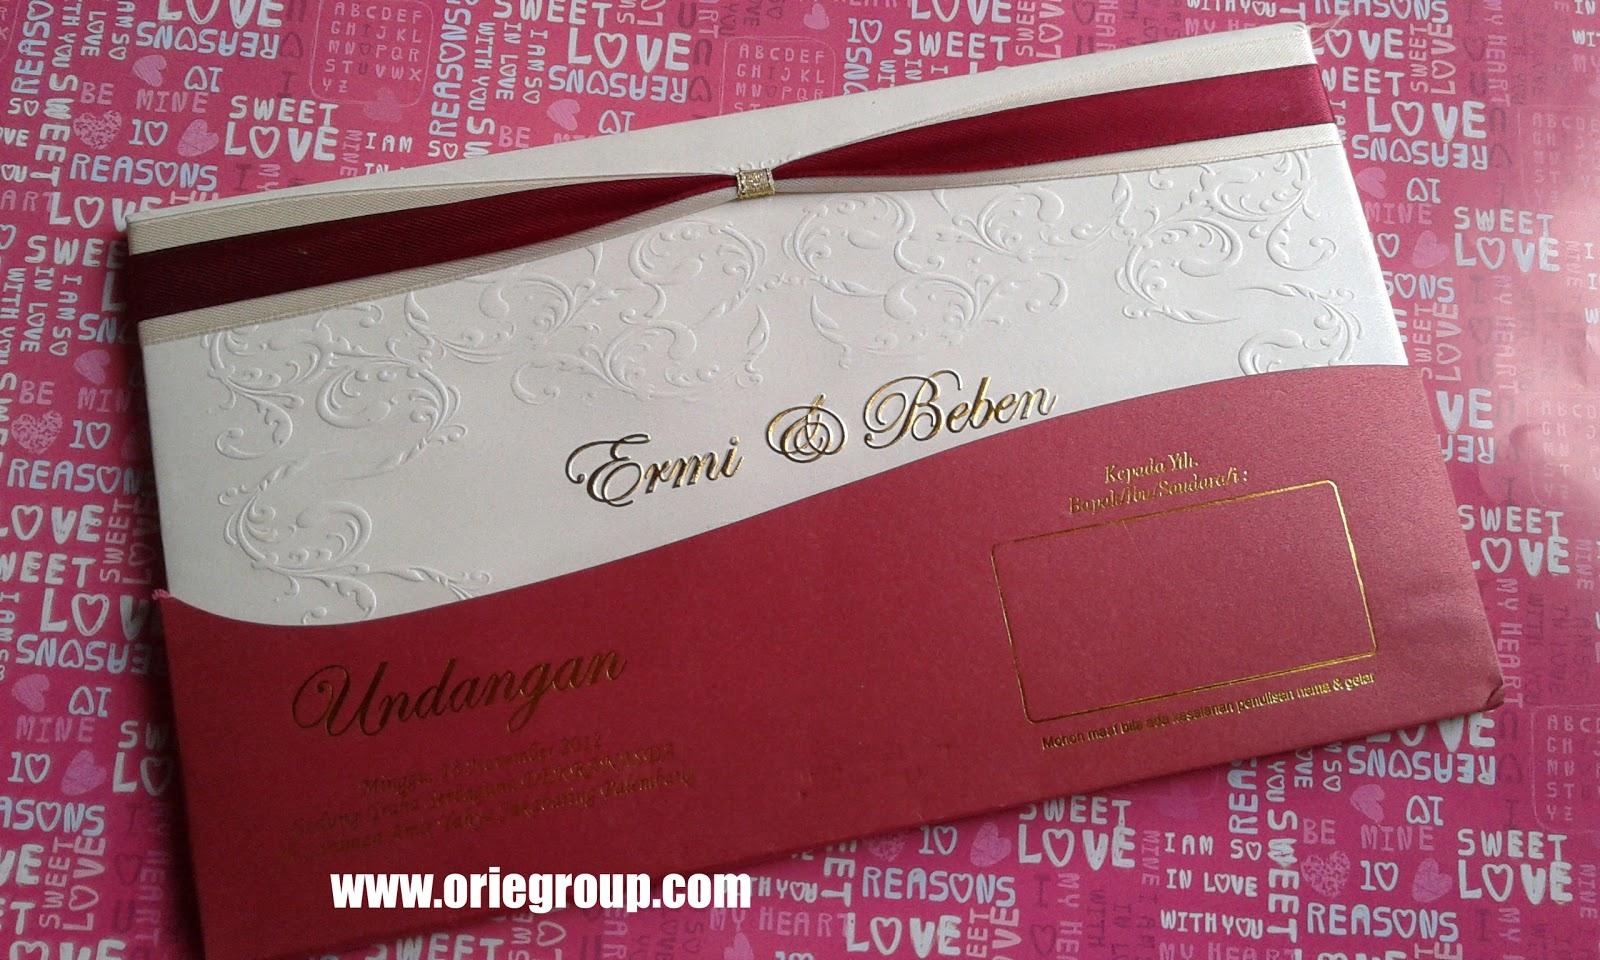 Percetakan Orie Kartu Undangan Wedding Card Palembang